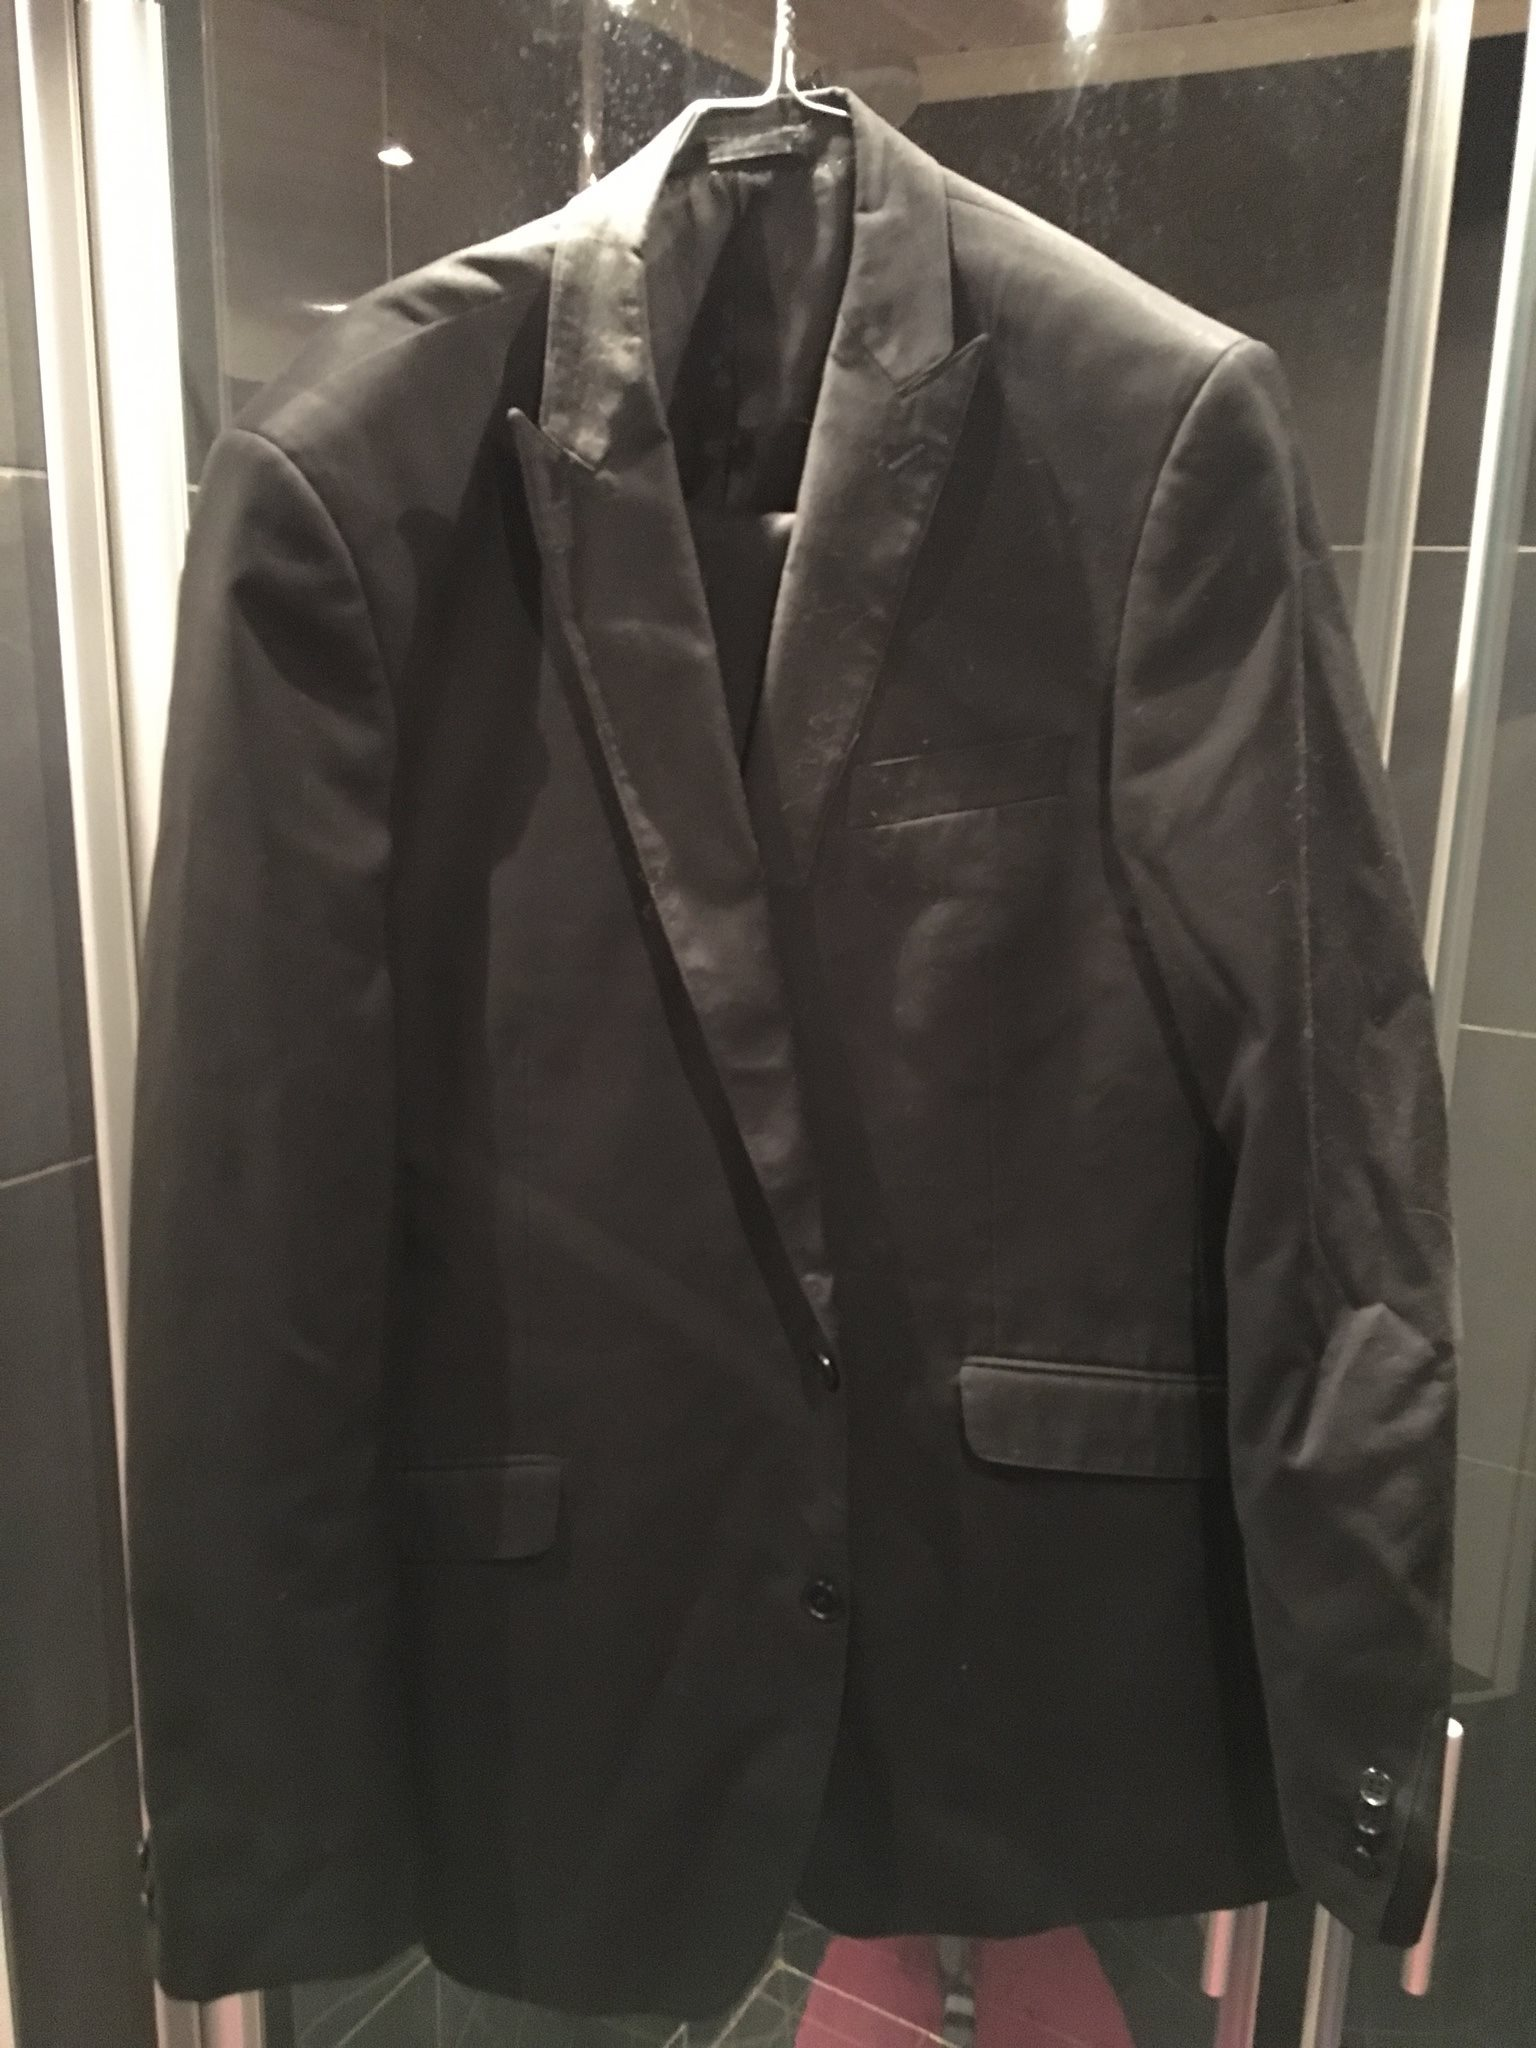 Kostym svart battistini storlek 54 (334216548) ᐈ Köp på Tradera a00fafdbffe85